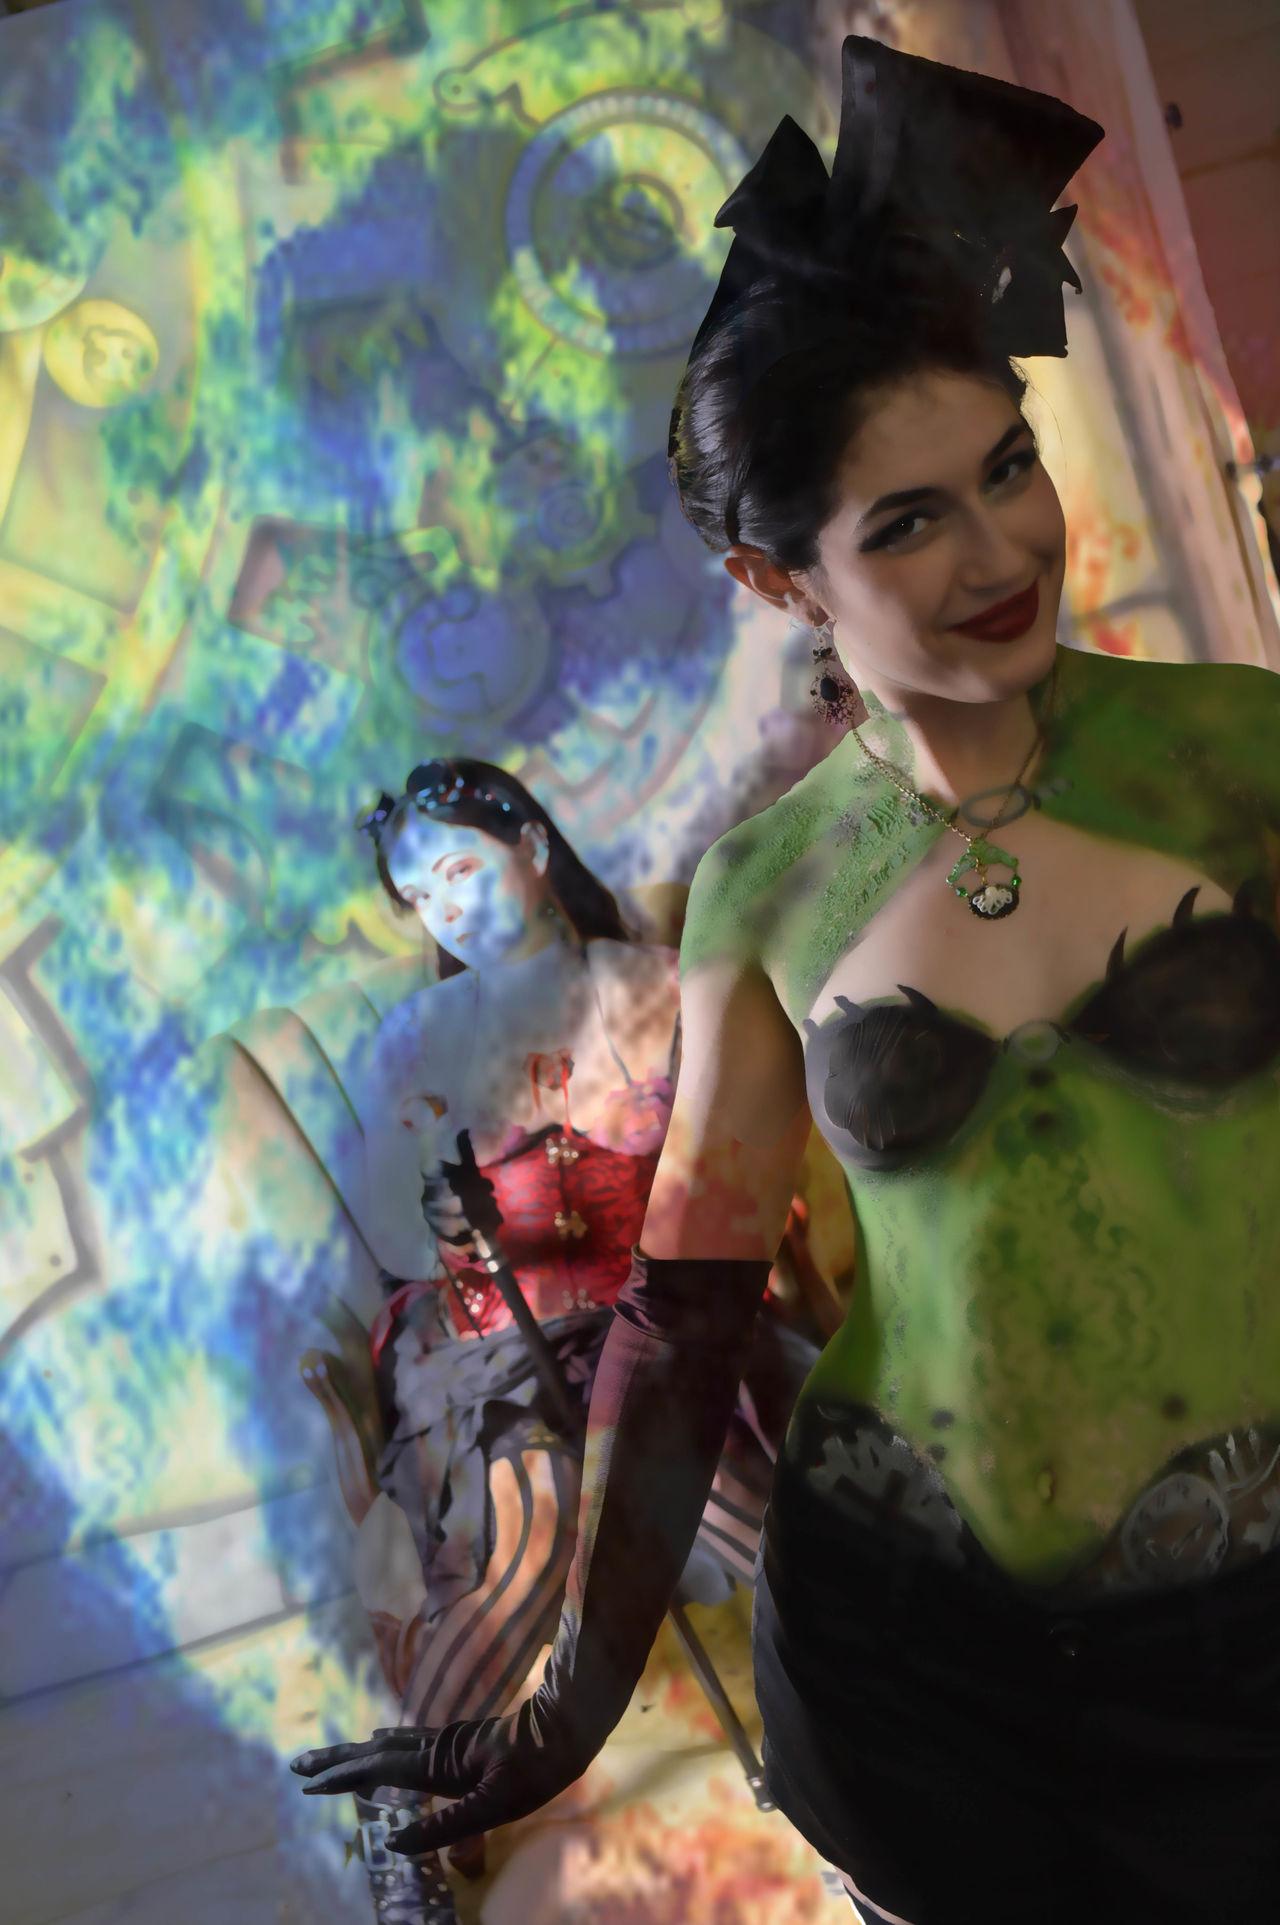 Beautiful Woman Bodyart Bodypaint Cosplay Indoors  Magic Magic Hands Portrait Trance Two People Women